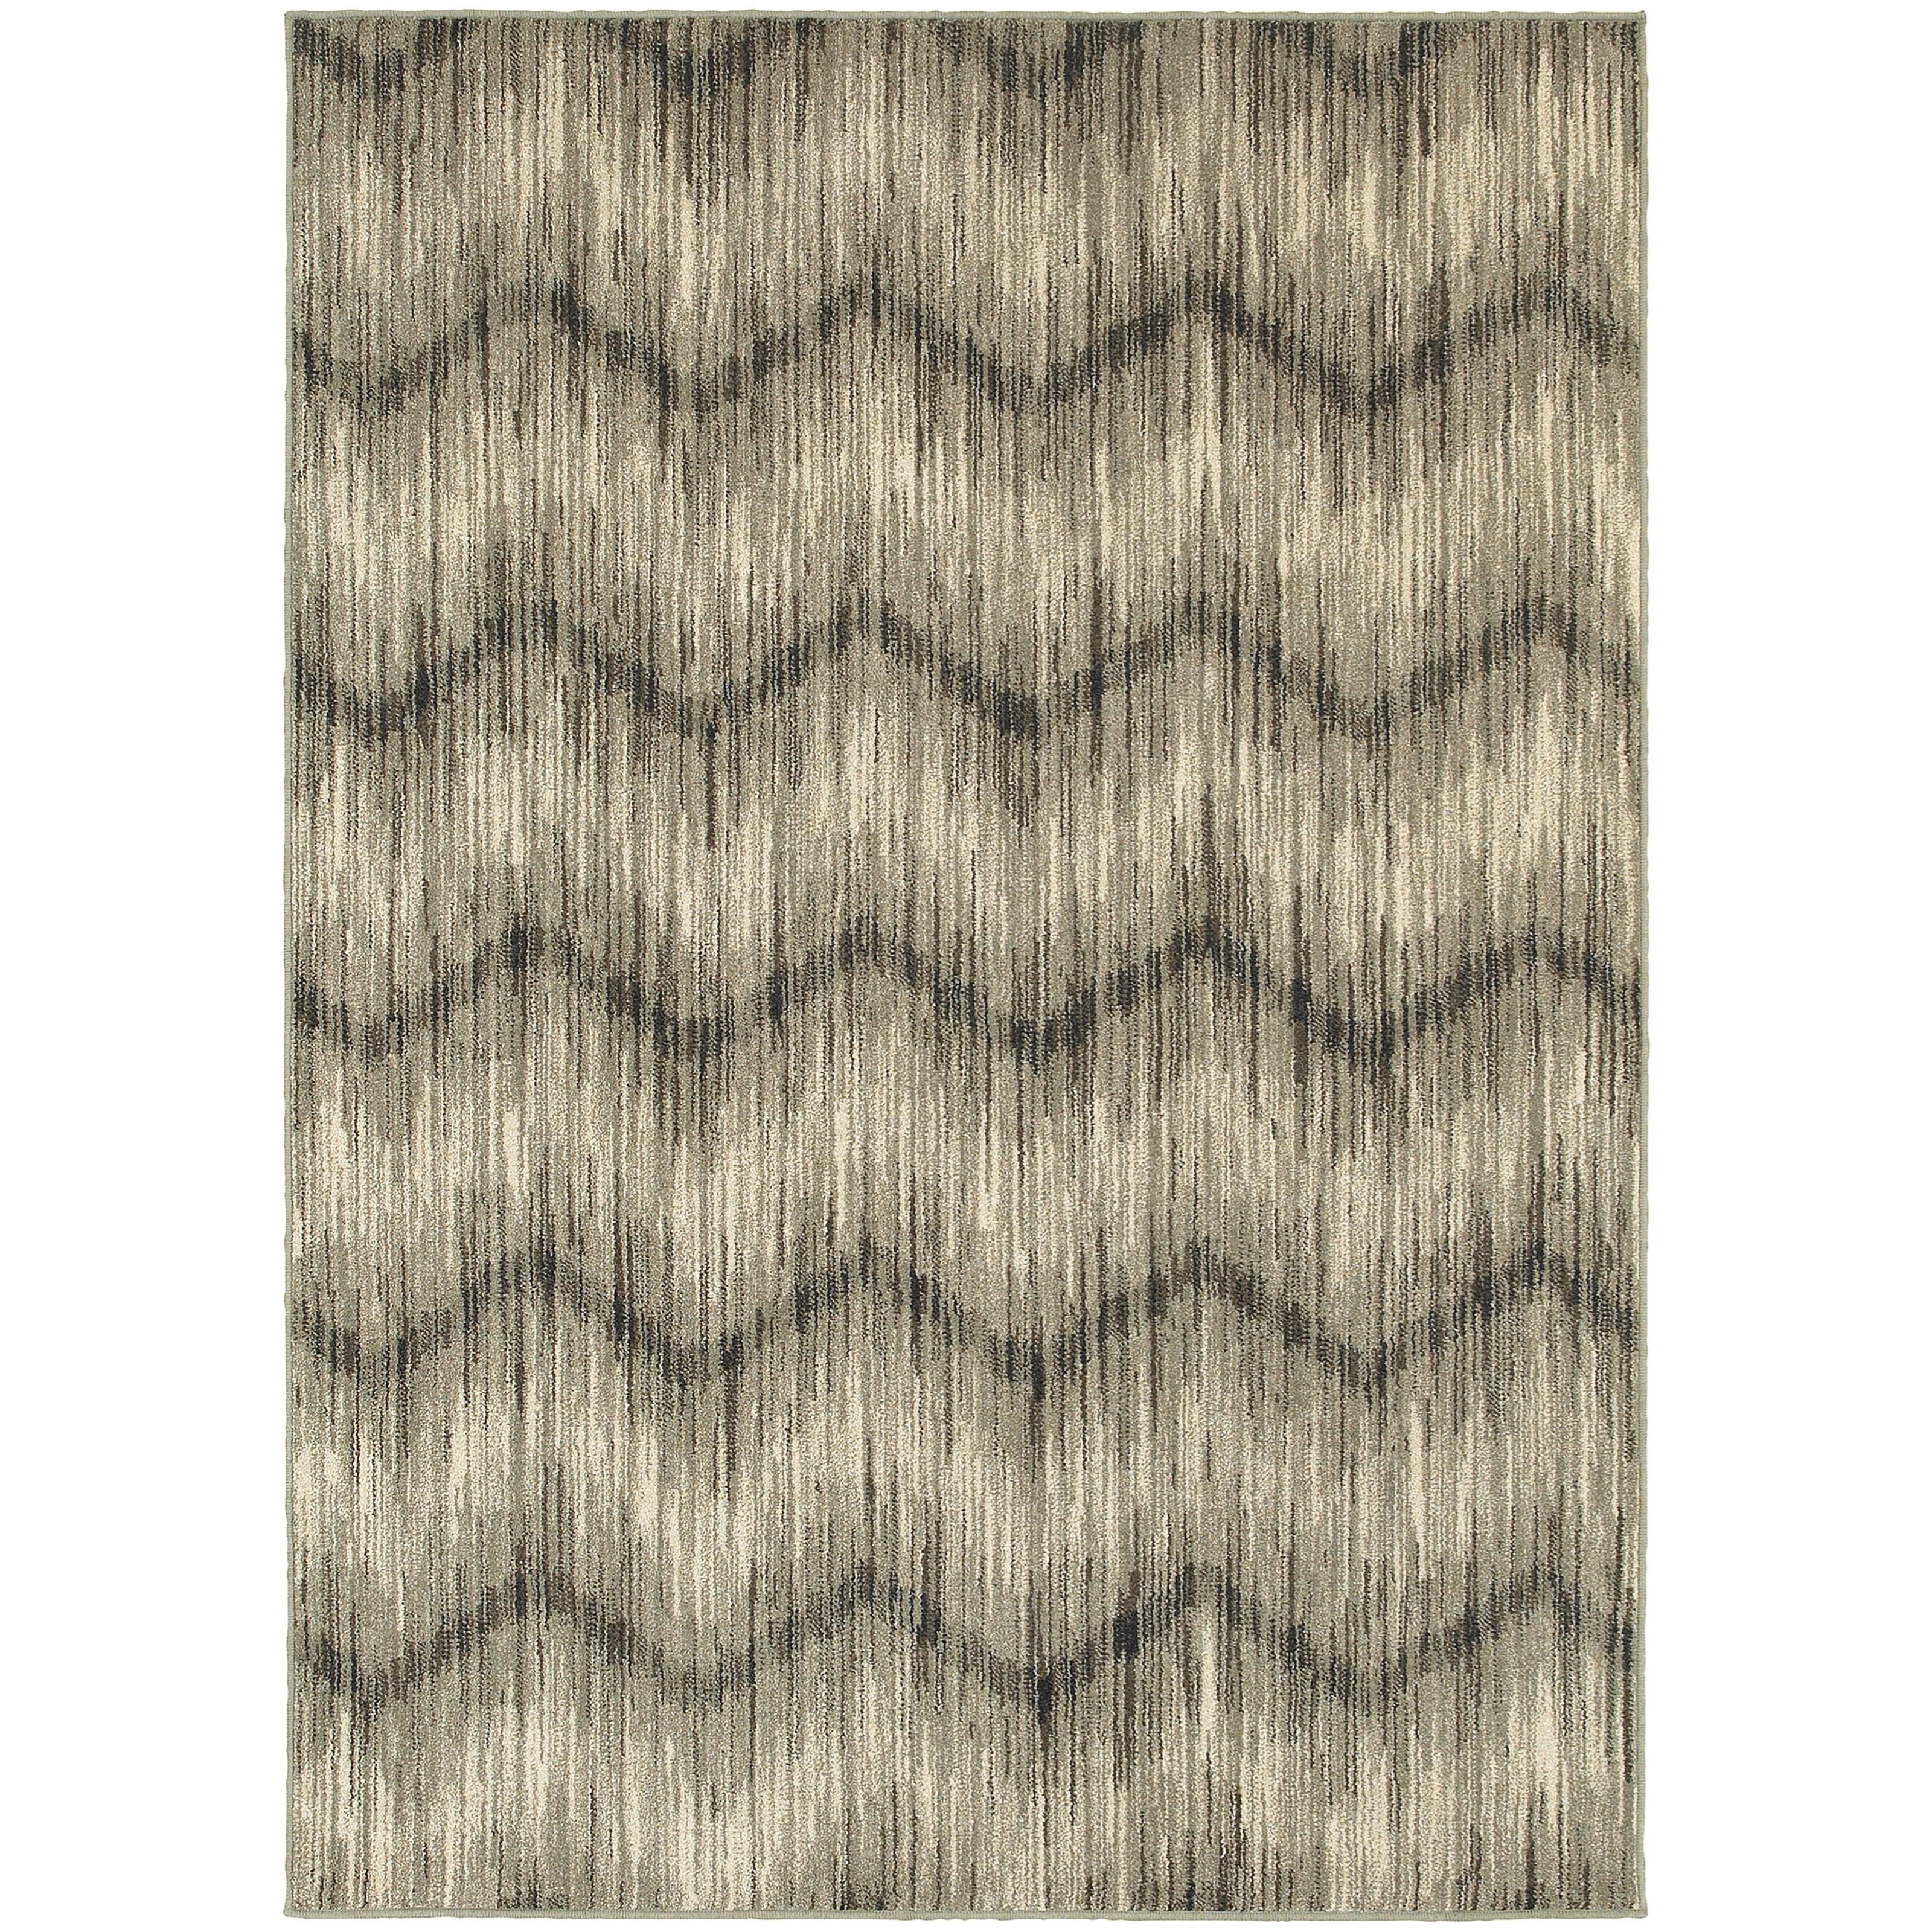 "Oriental Weavers Highlands 9'10"" X 12'10"" Rectangle Area Rug - Item Number: HIG6608A910X1210"